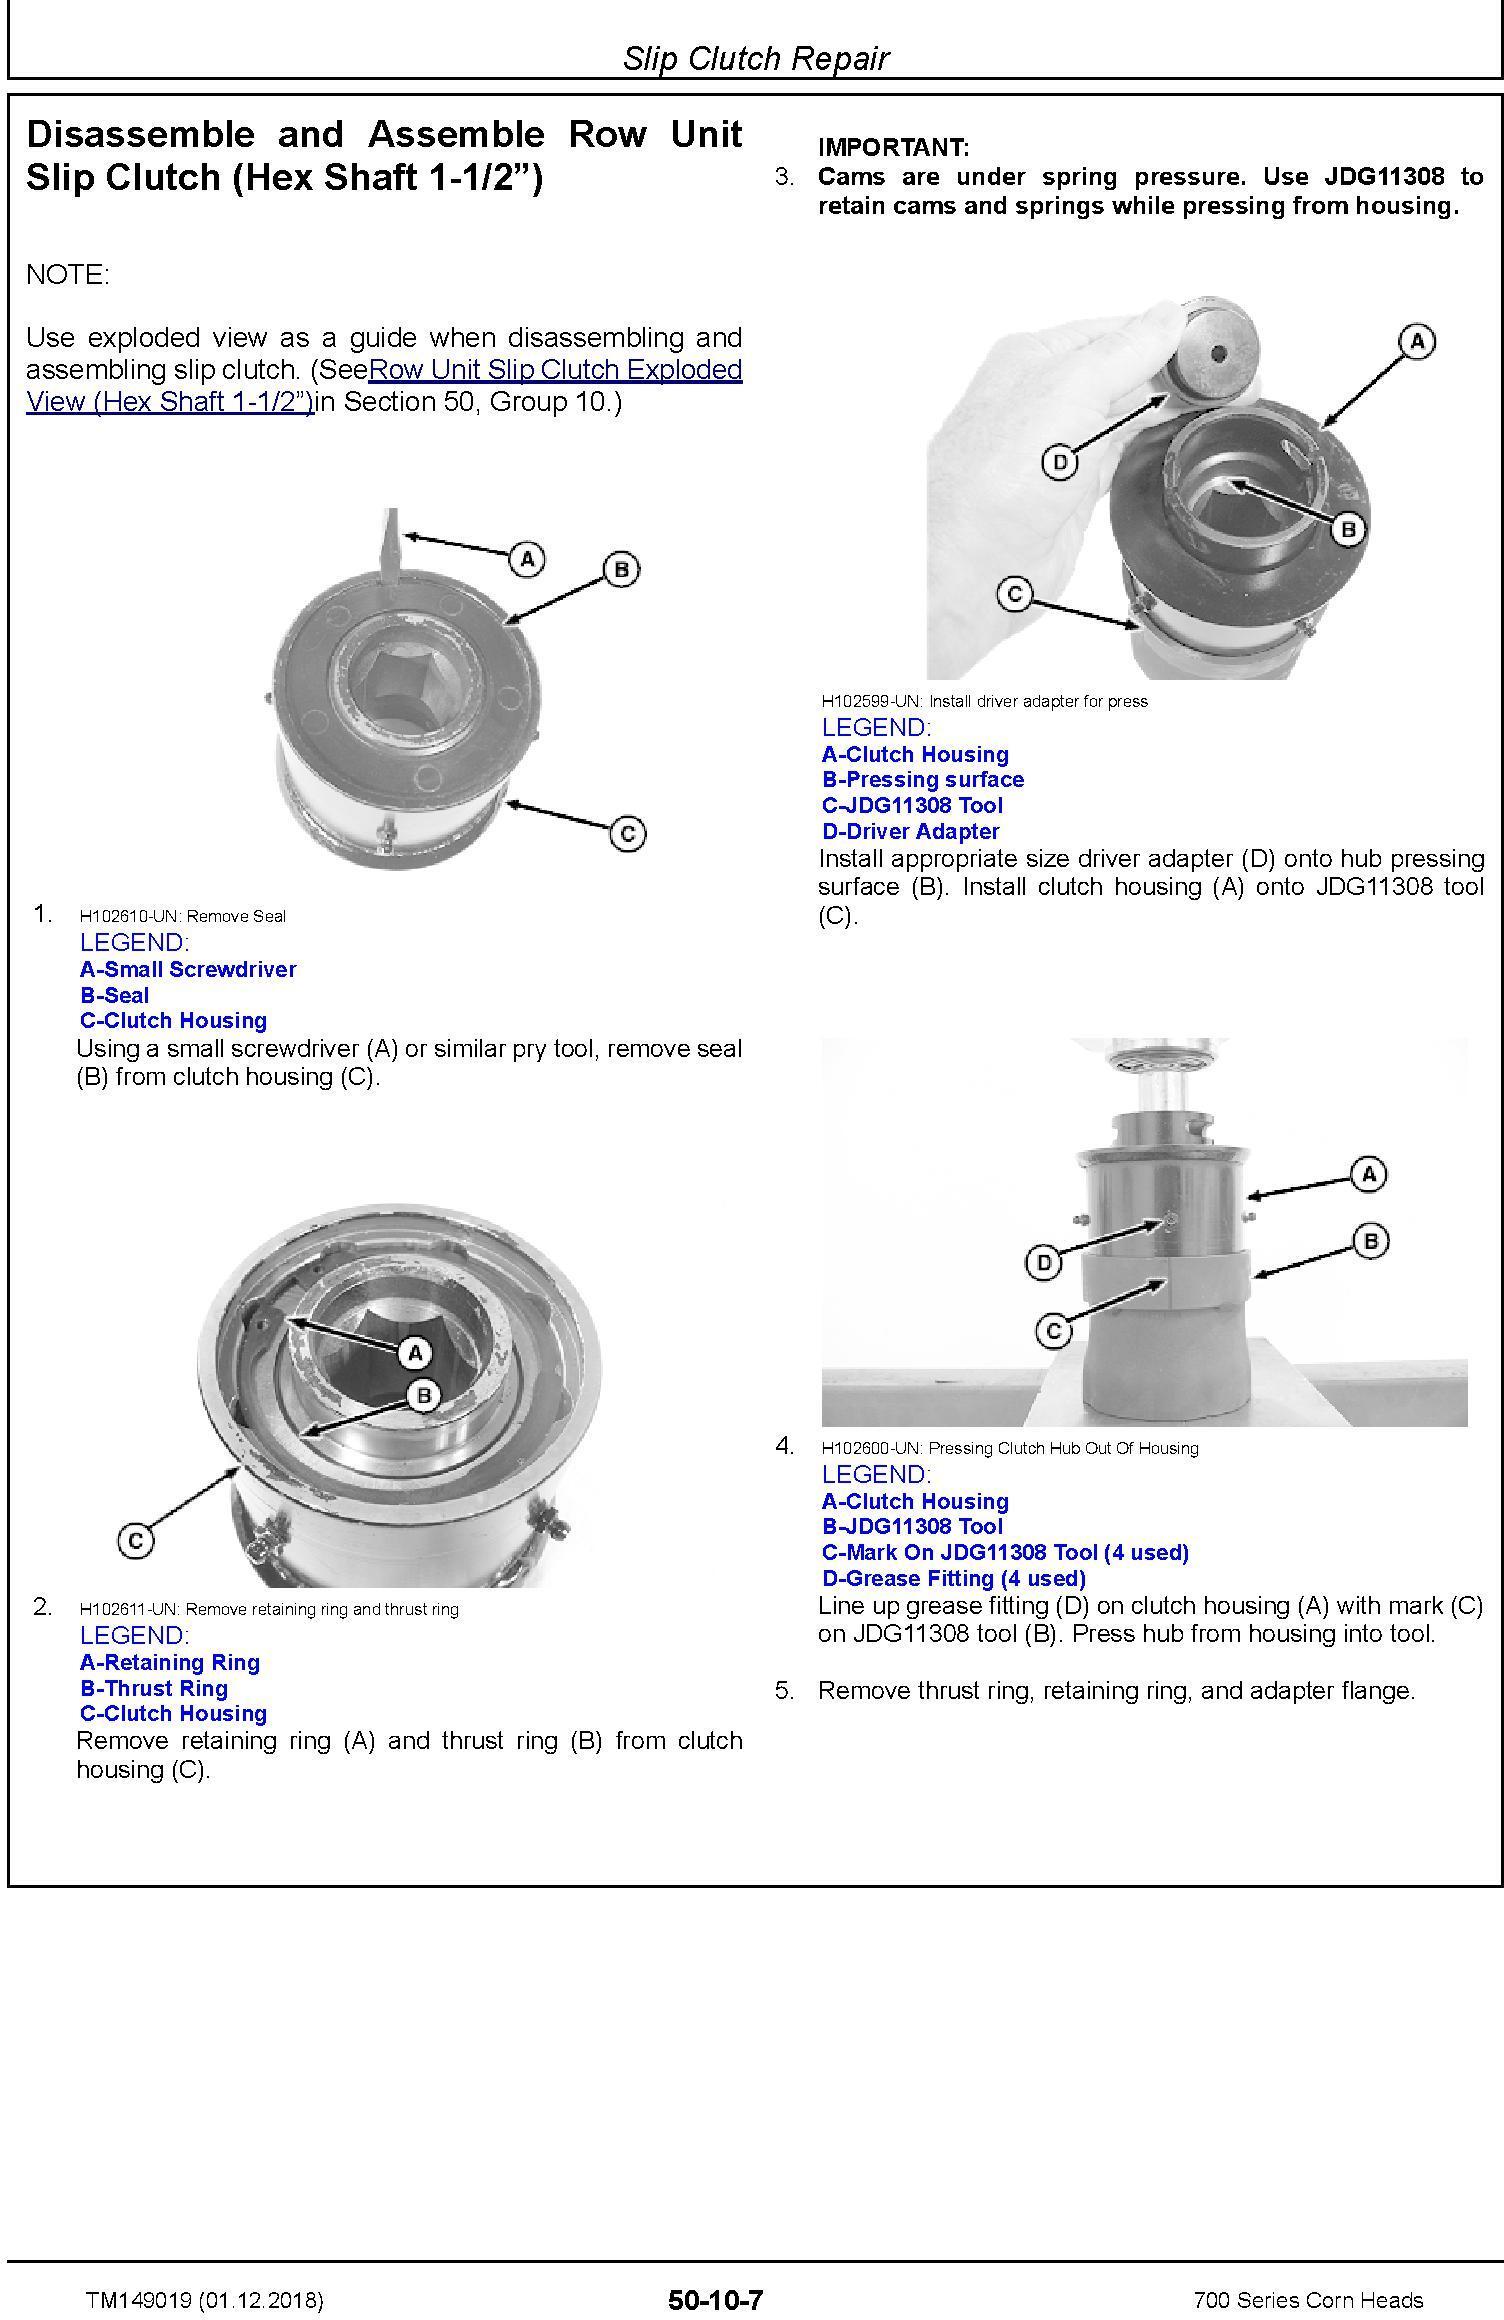 JD John Deere 706C, 708C, 712C, 712FC, 716C, 718C Corn Heads Repair Technical Service Manual (TM149019) - 1